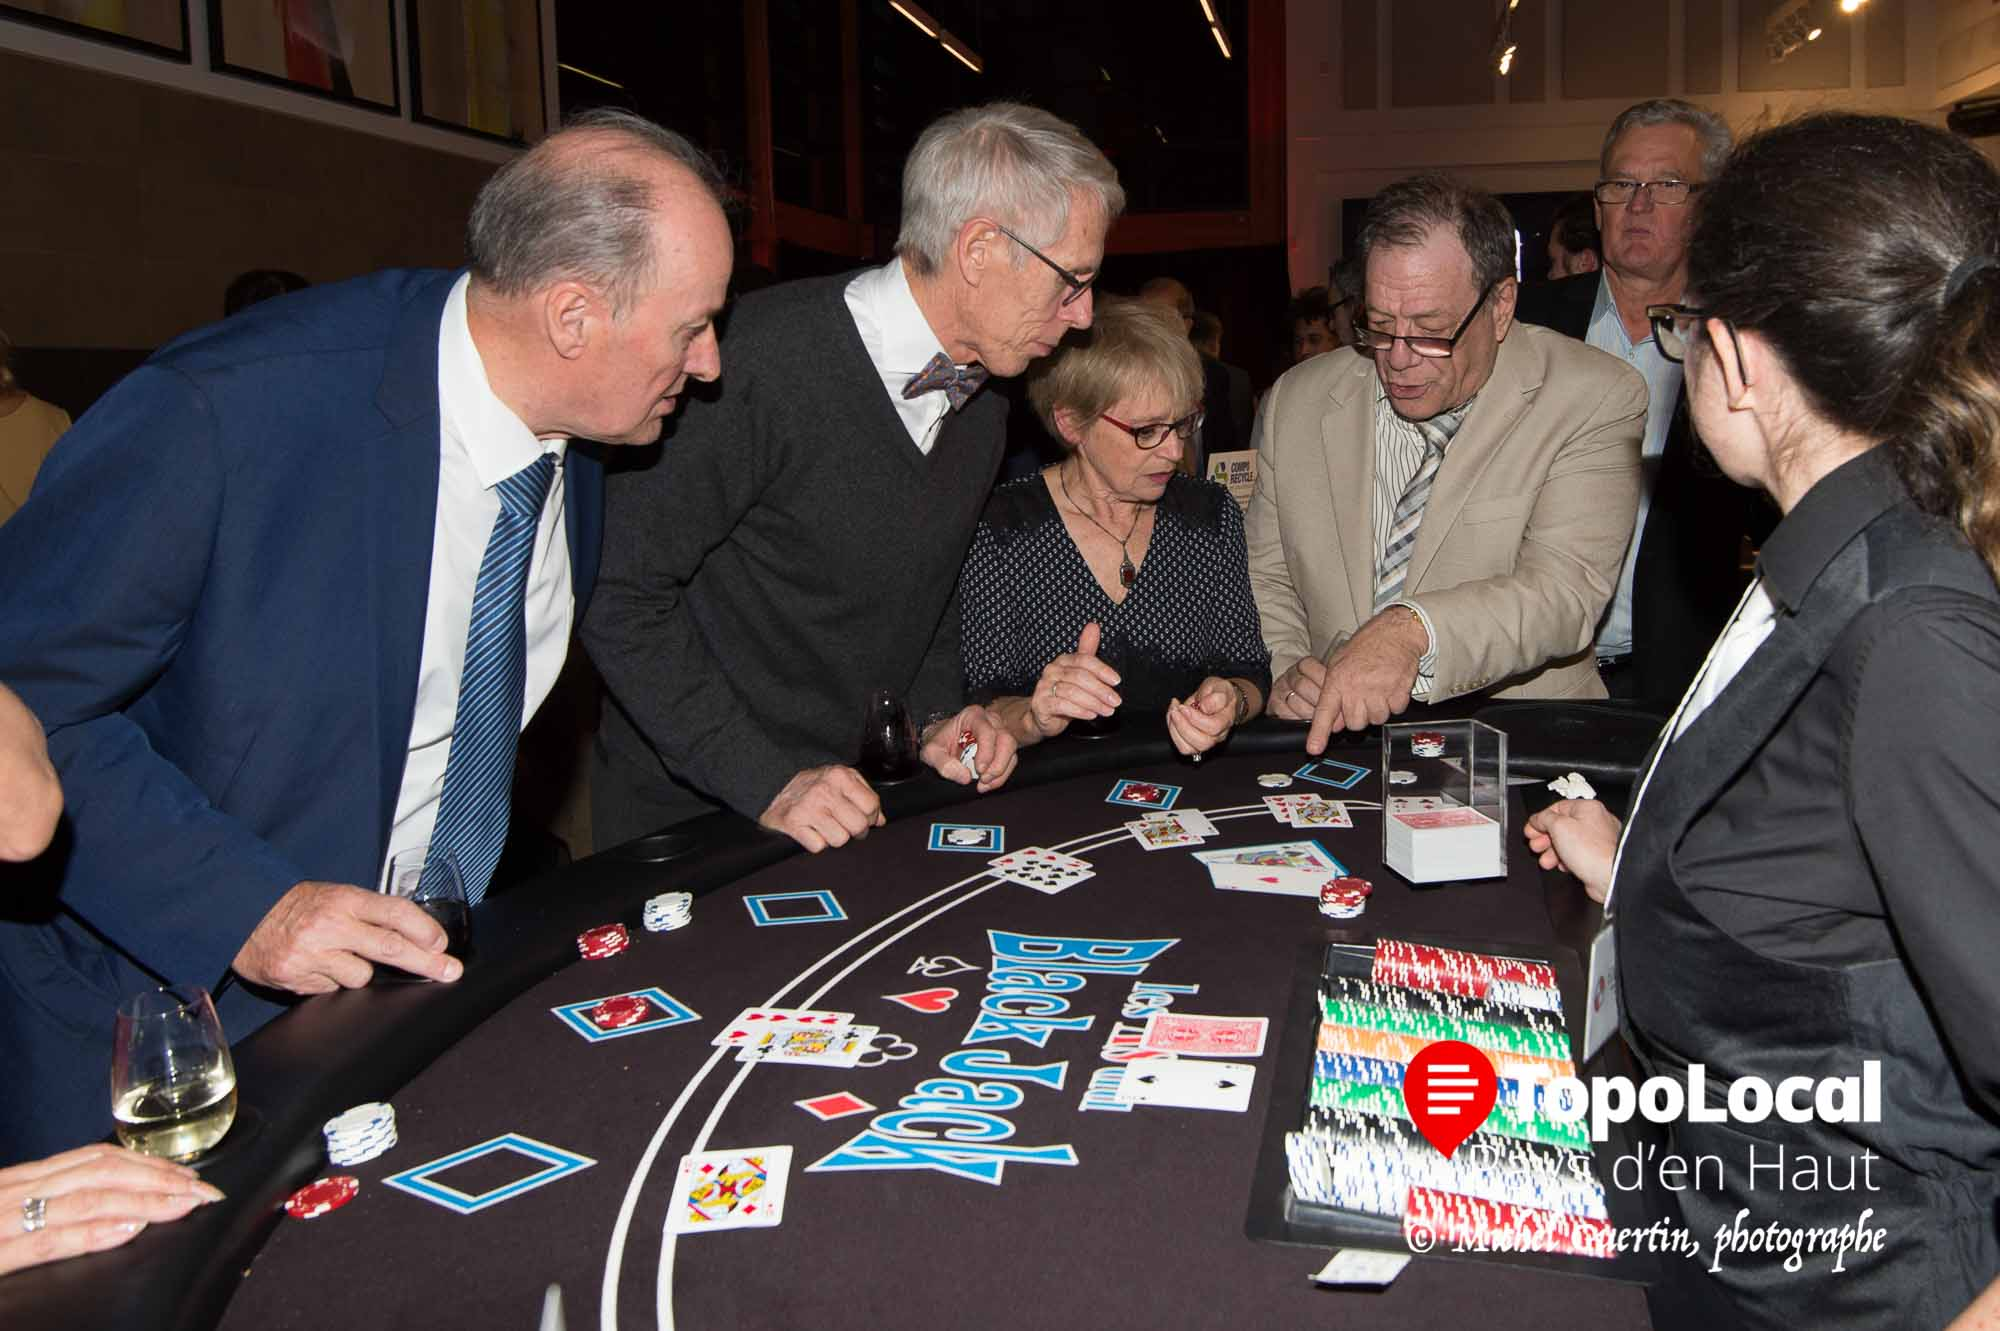 20161104-sainte-adele-casino-maire-place-ciroyens-culture-3